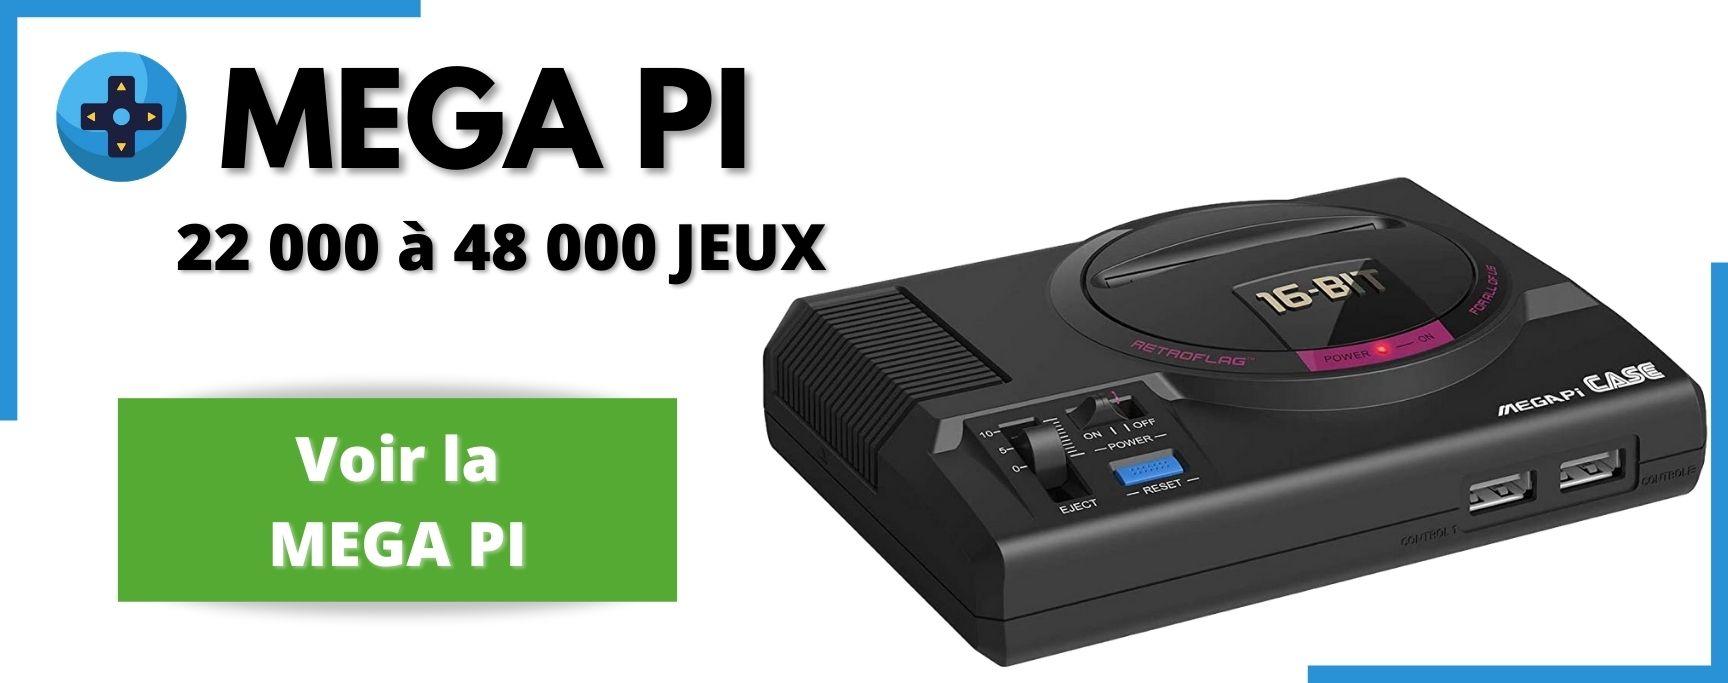 https://www.la-console-retro.fr/collections/nos-consoles-retrogaming/products/mega-pi